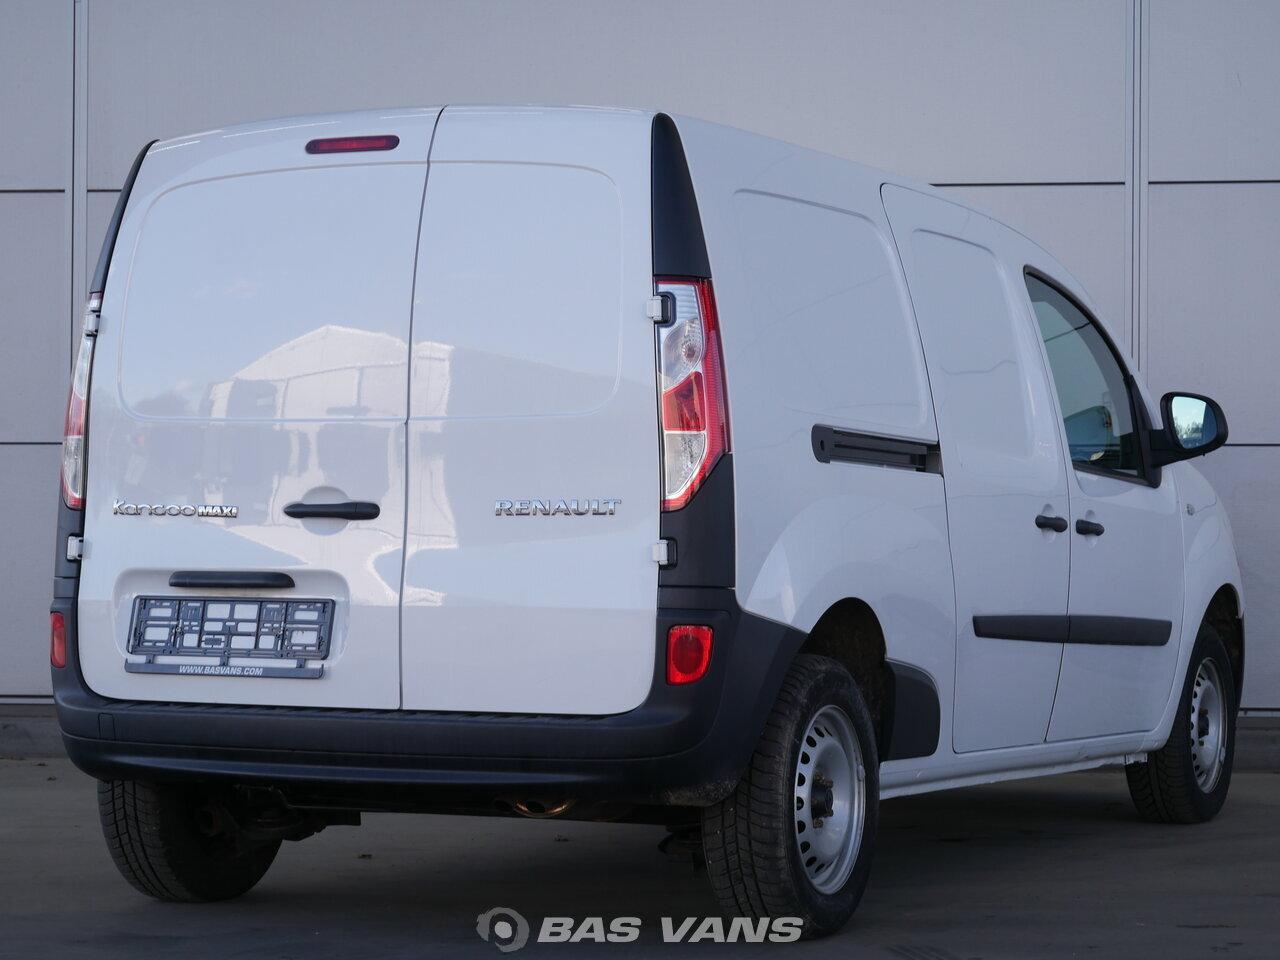 Renault Kangoo Express Maxi L3 2015 Bas Vans